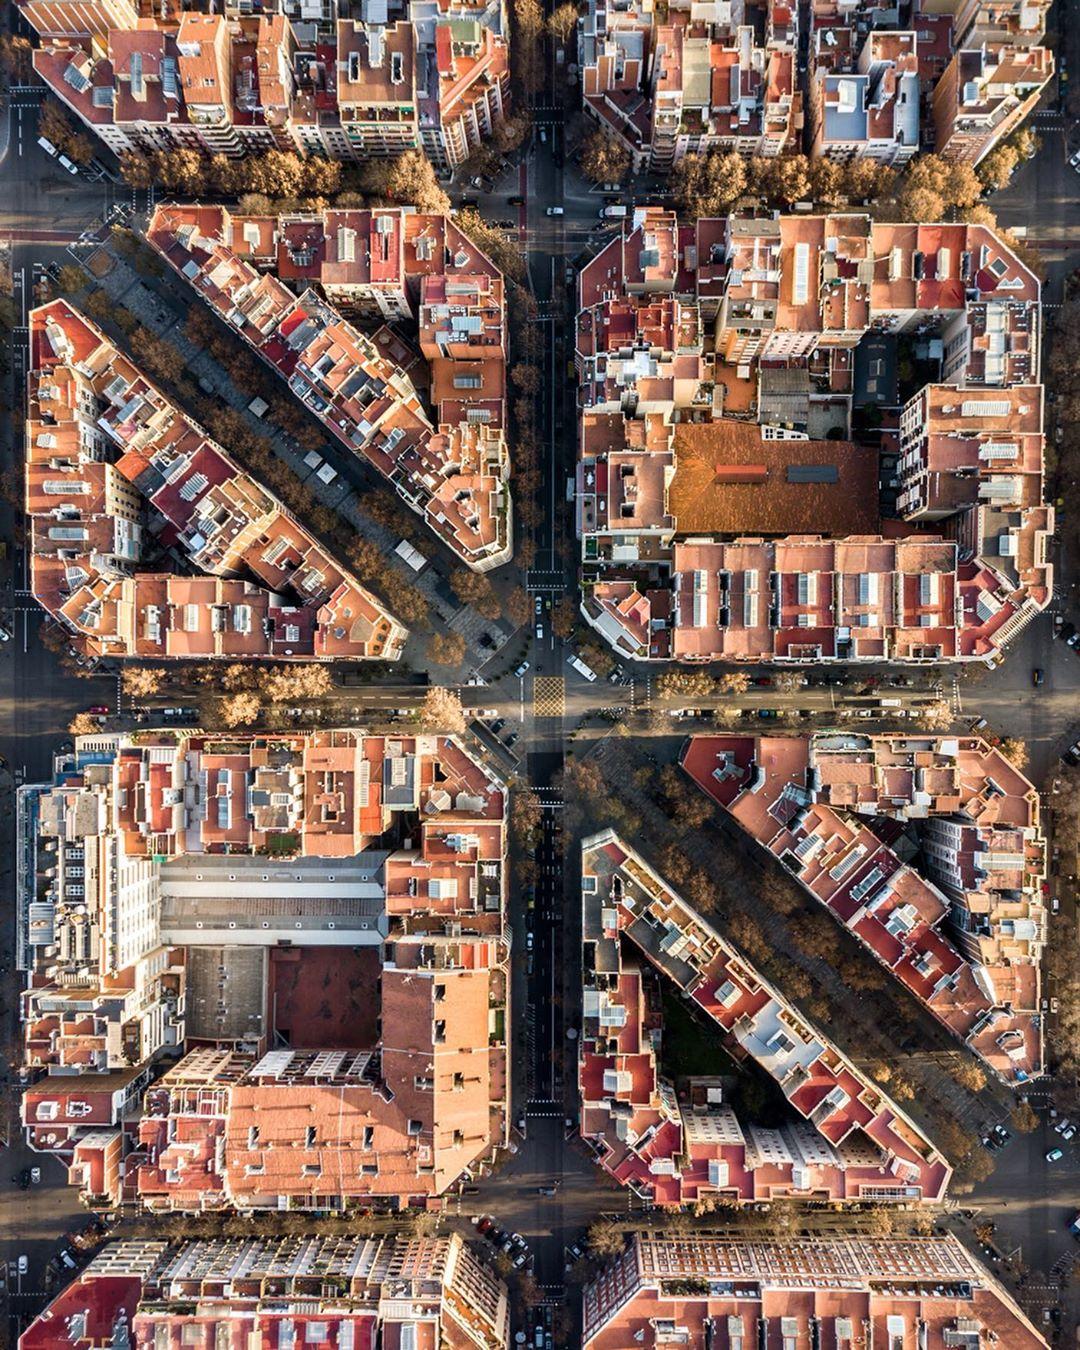 Barcelona aérea drone Marton Mogyorosy loqueva (17)